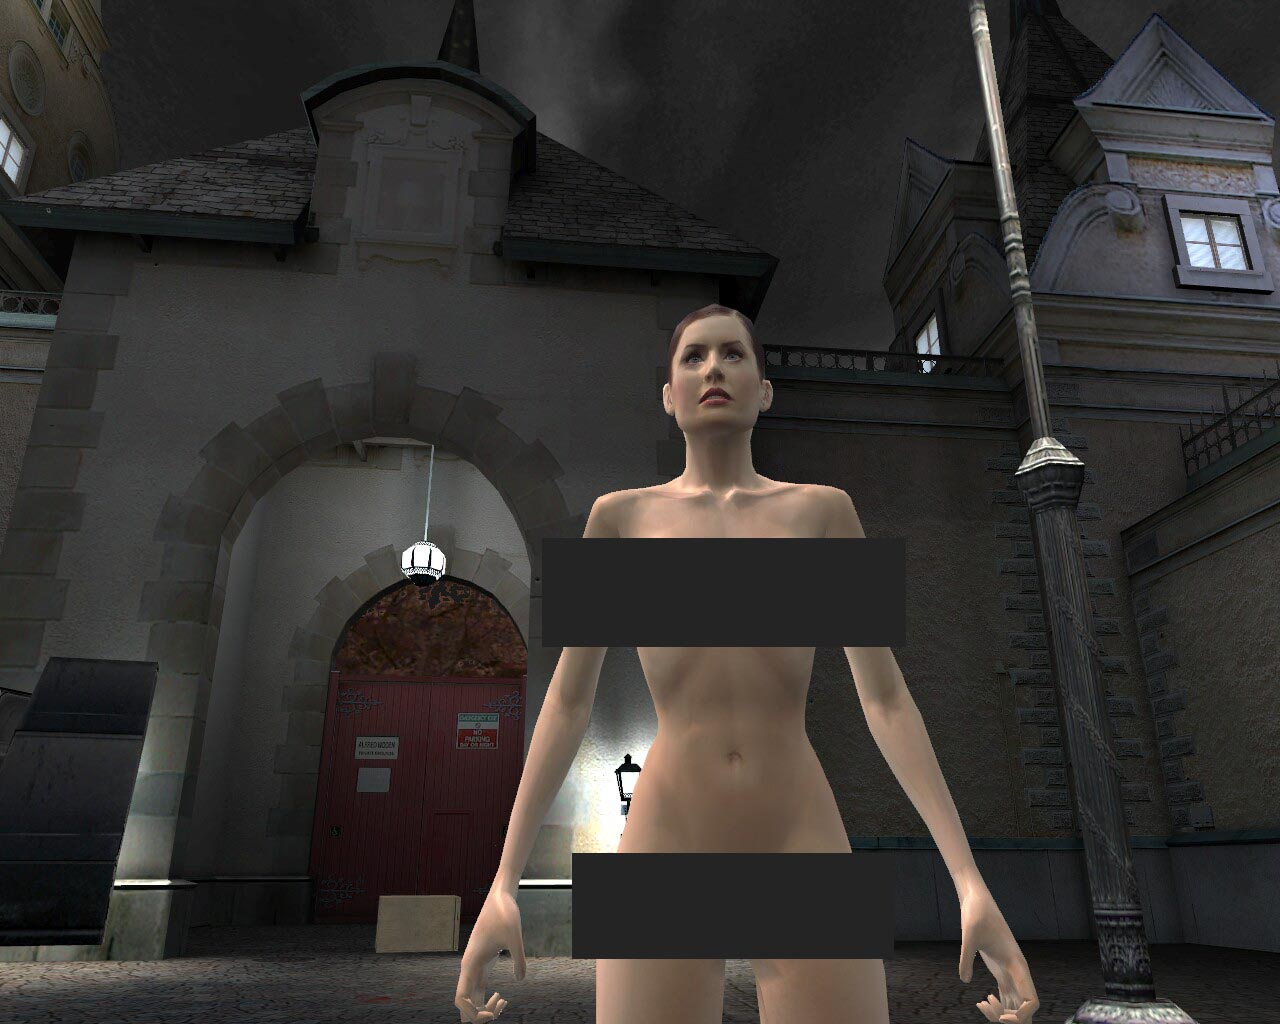 Max payne 2 mods nude xxx pornos vids